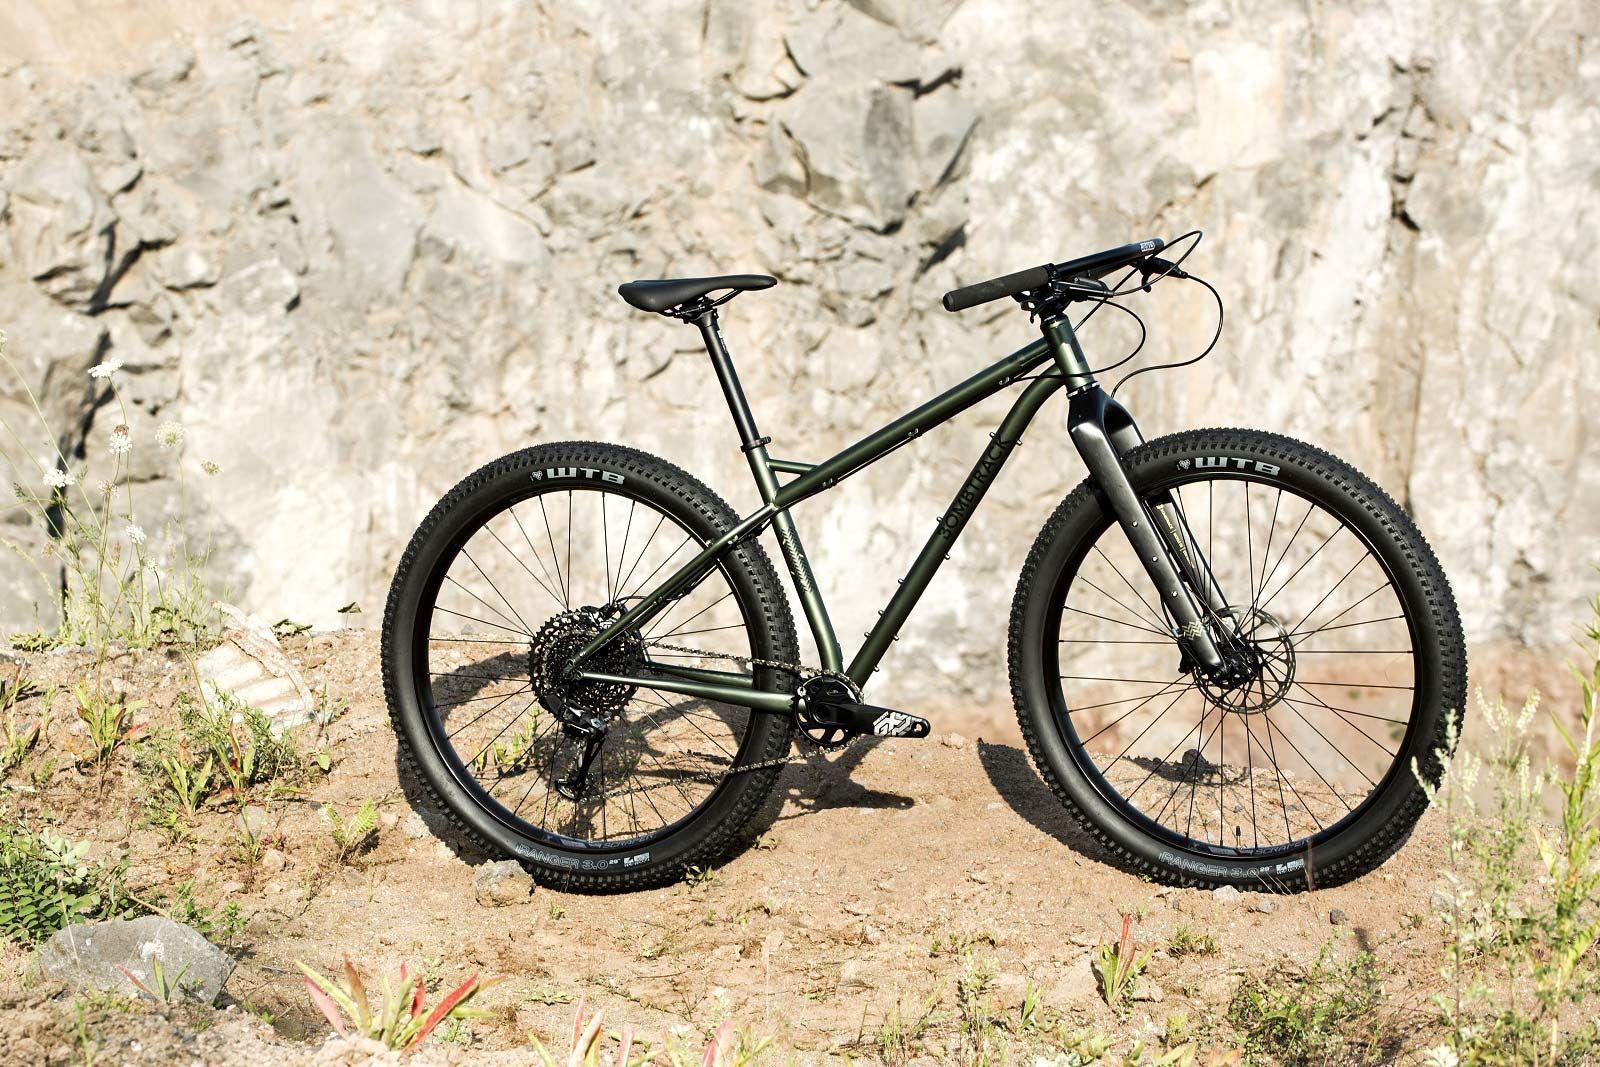 Bombtrack Beyond Adv 29 Expedition Mountain Bike Ventures Even